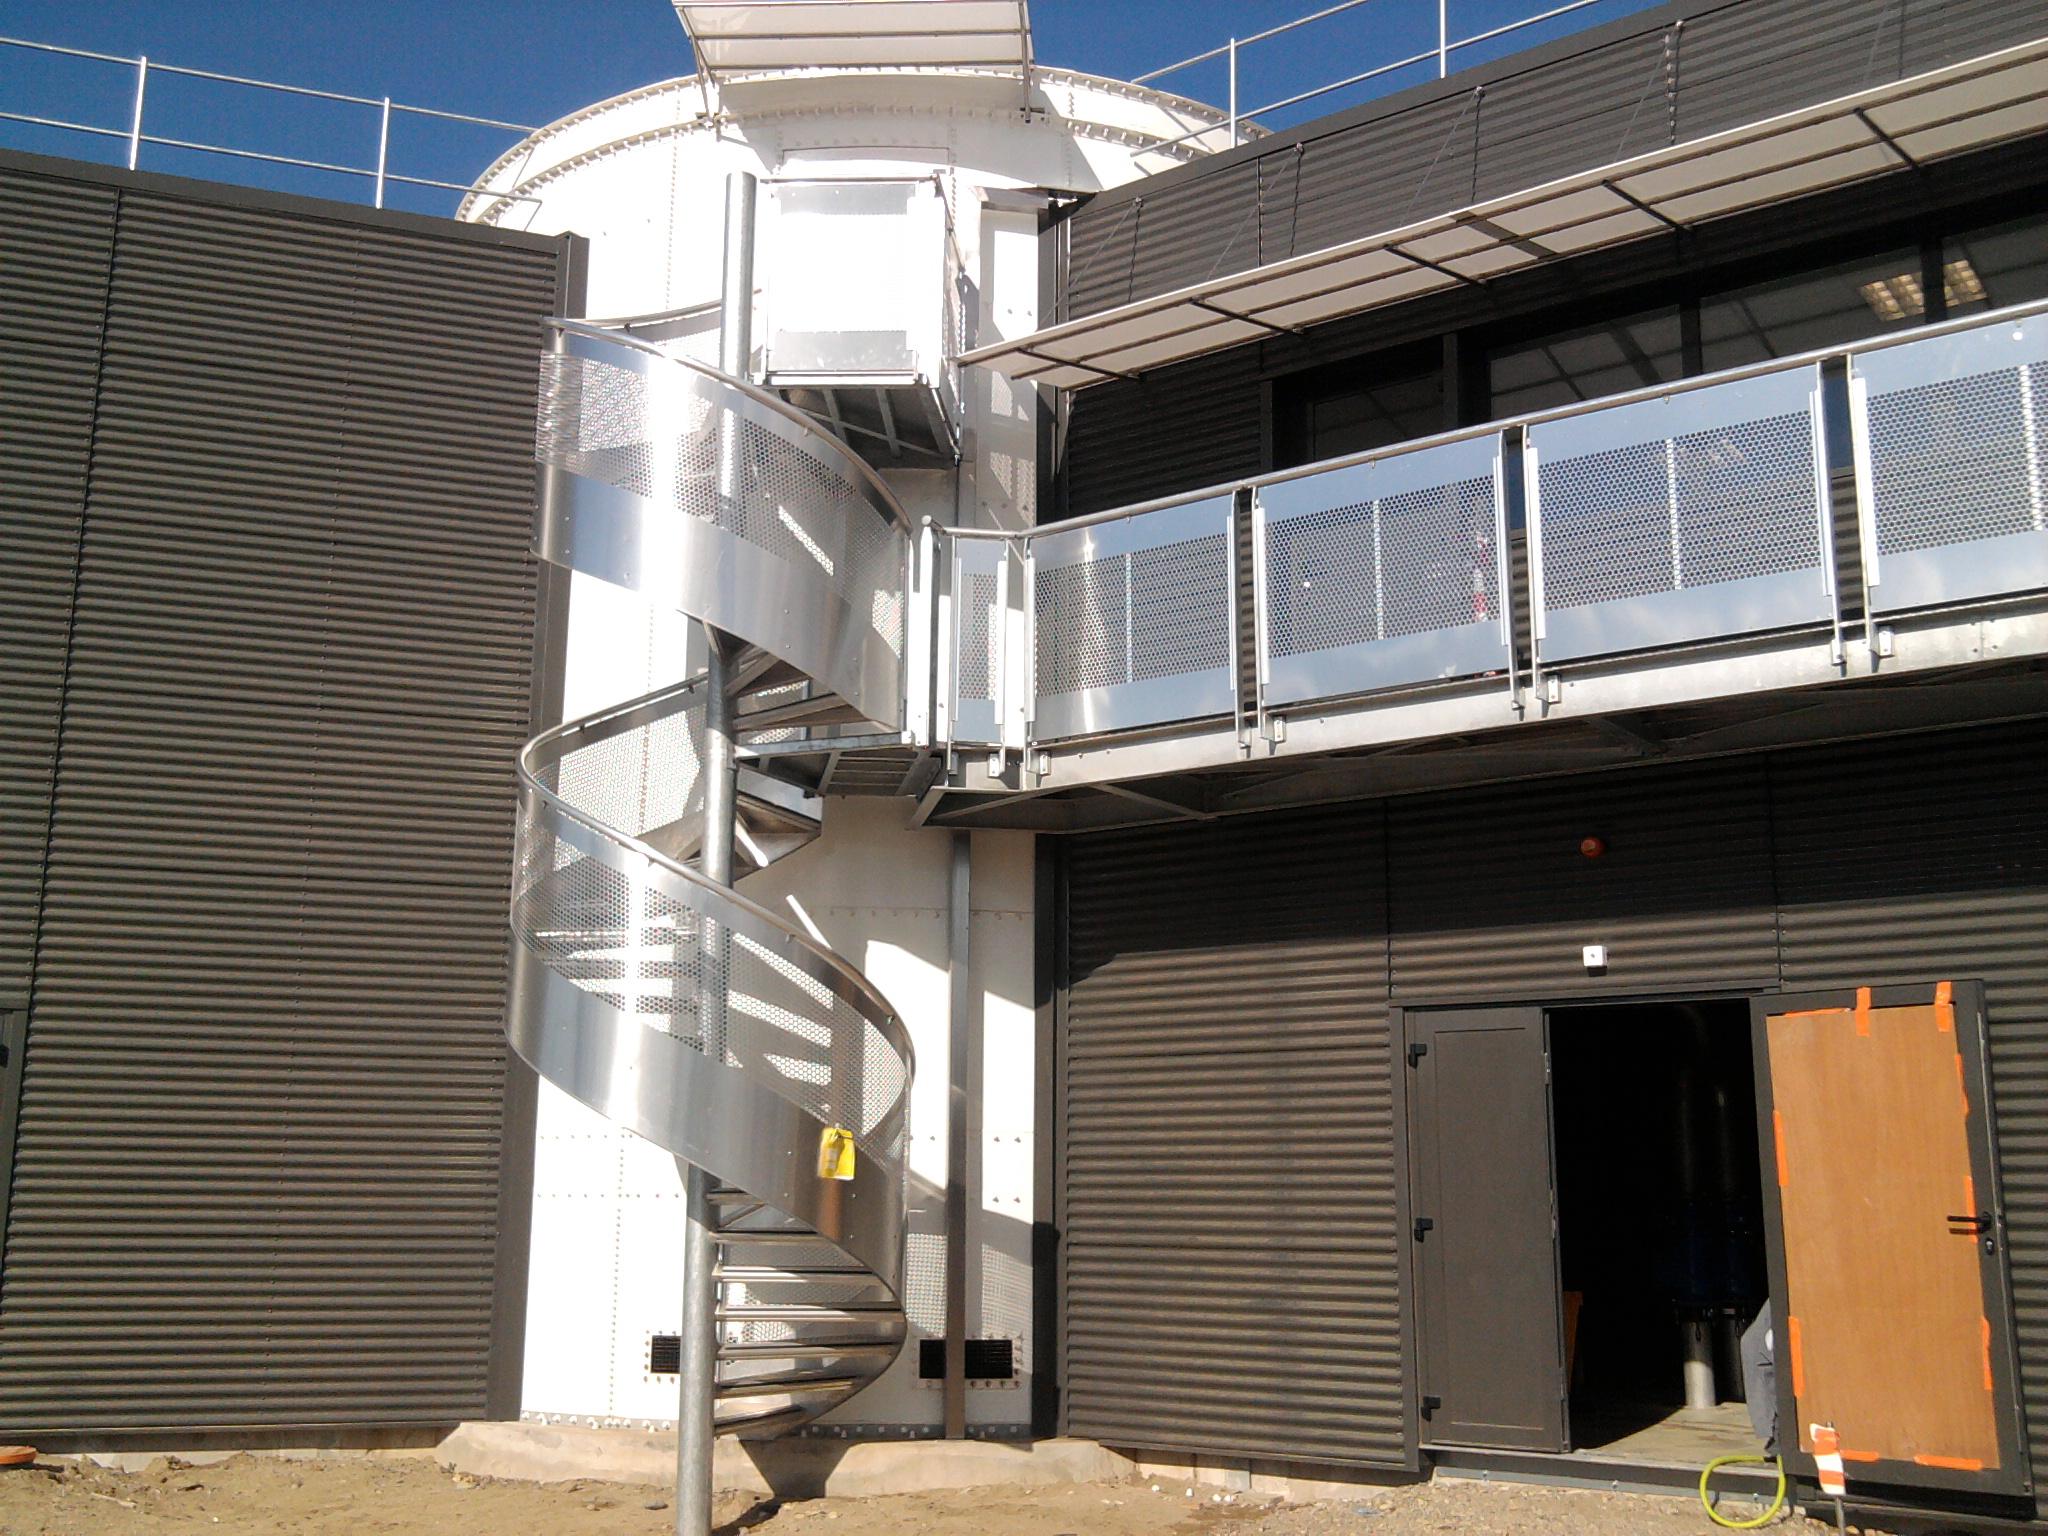 Escalier et balcon Inox et Acier galvanisé